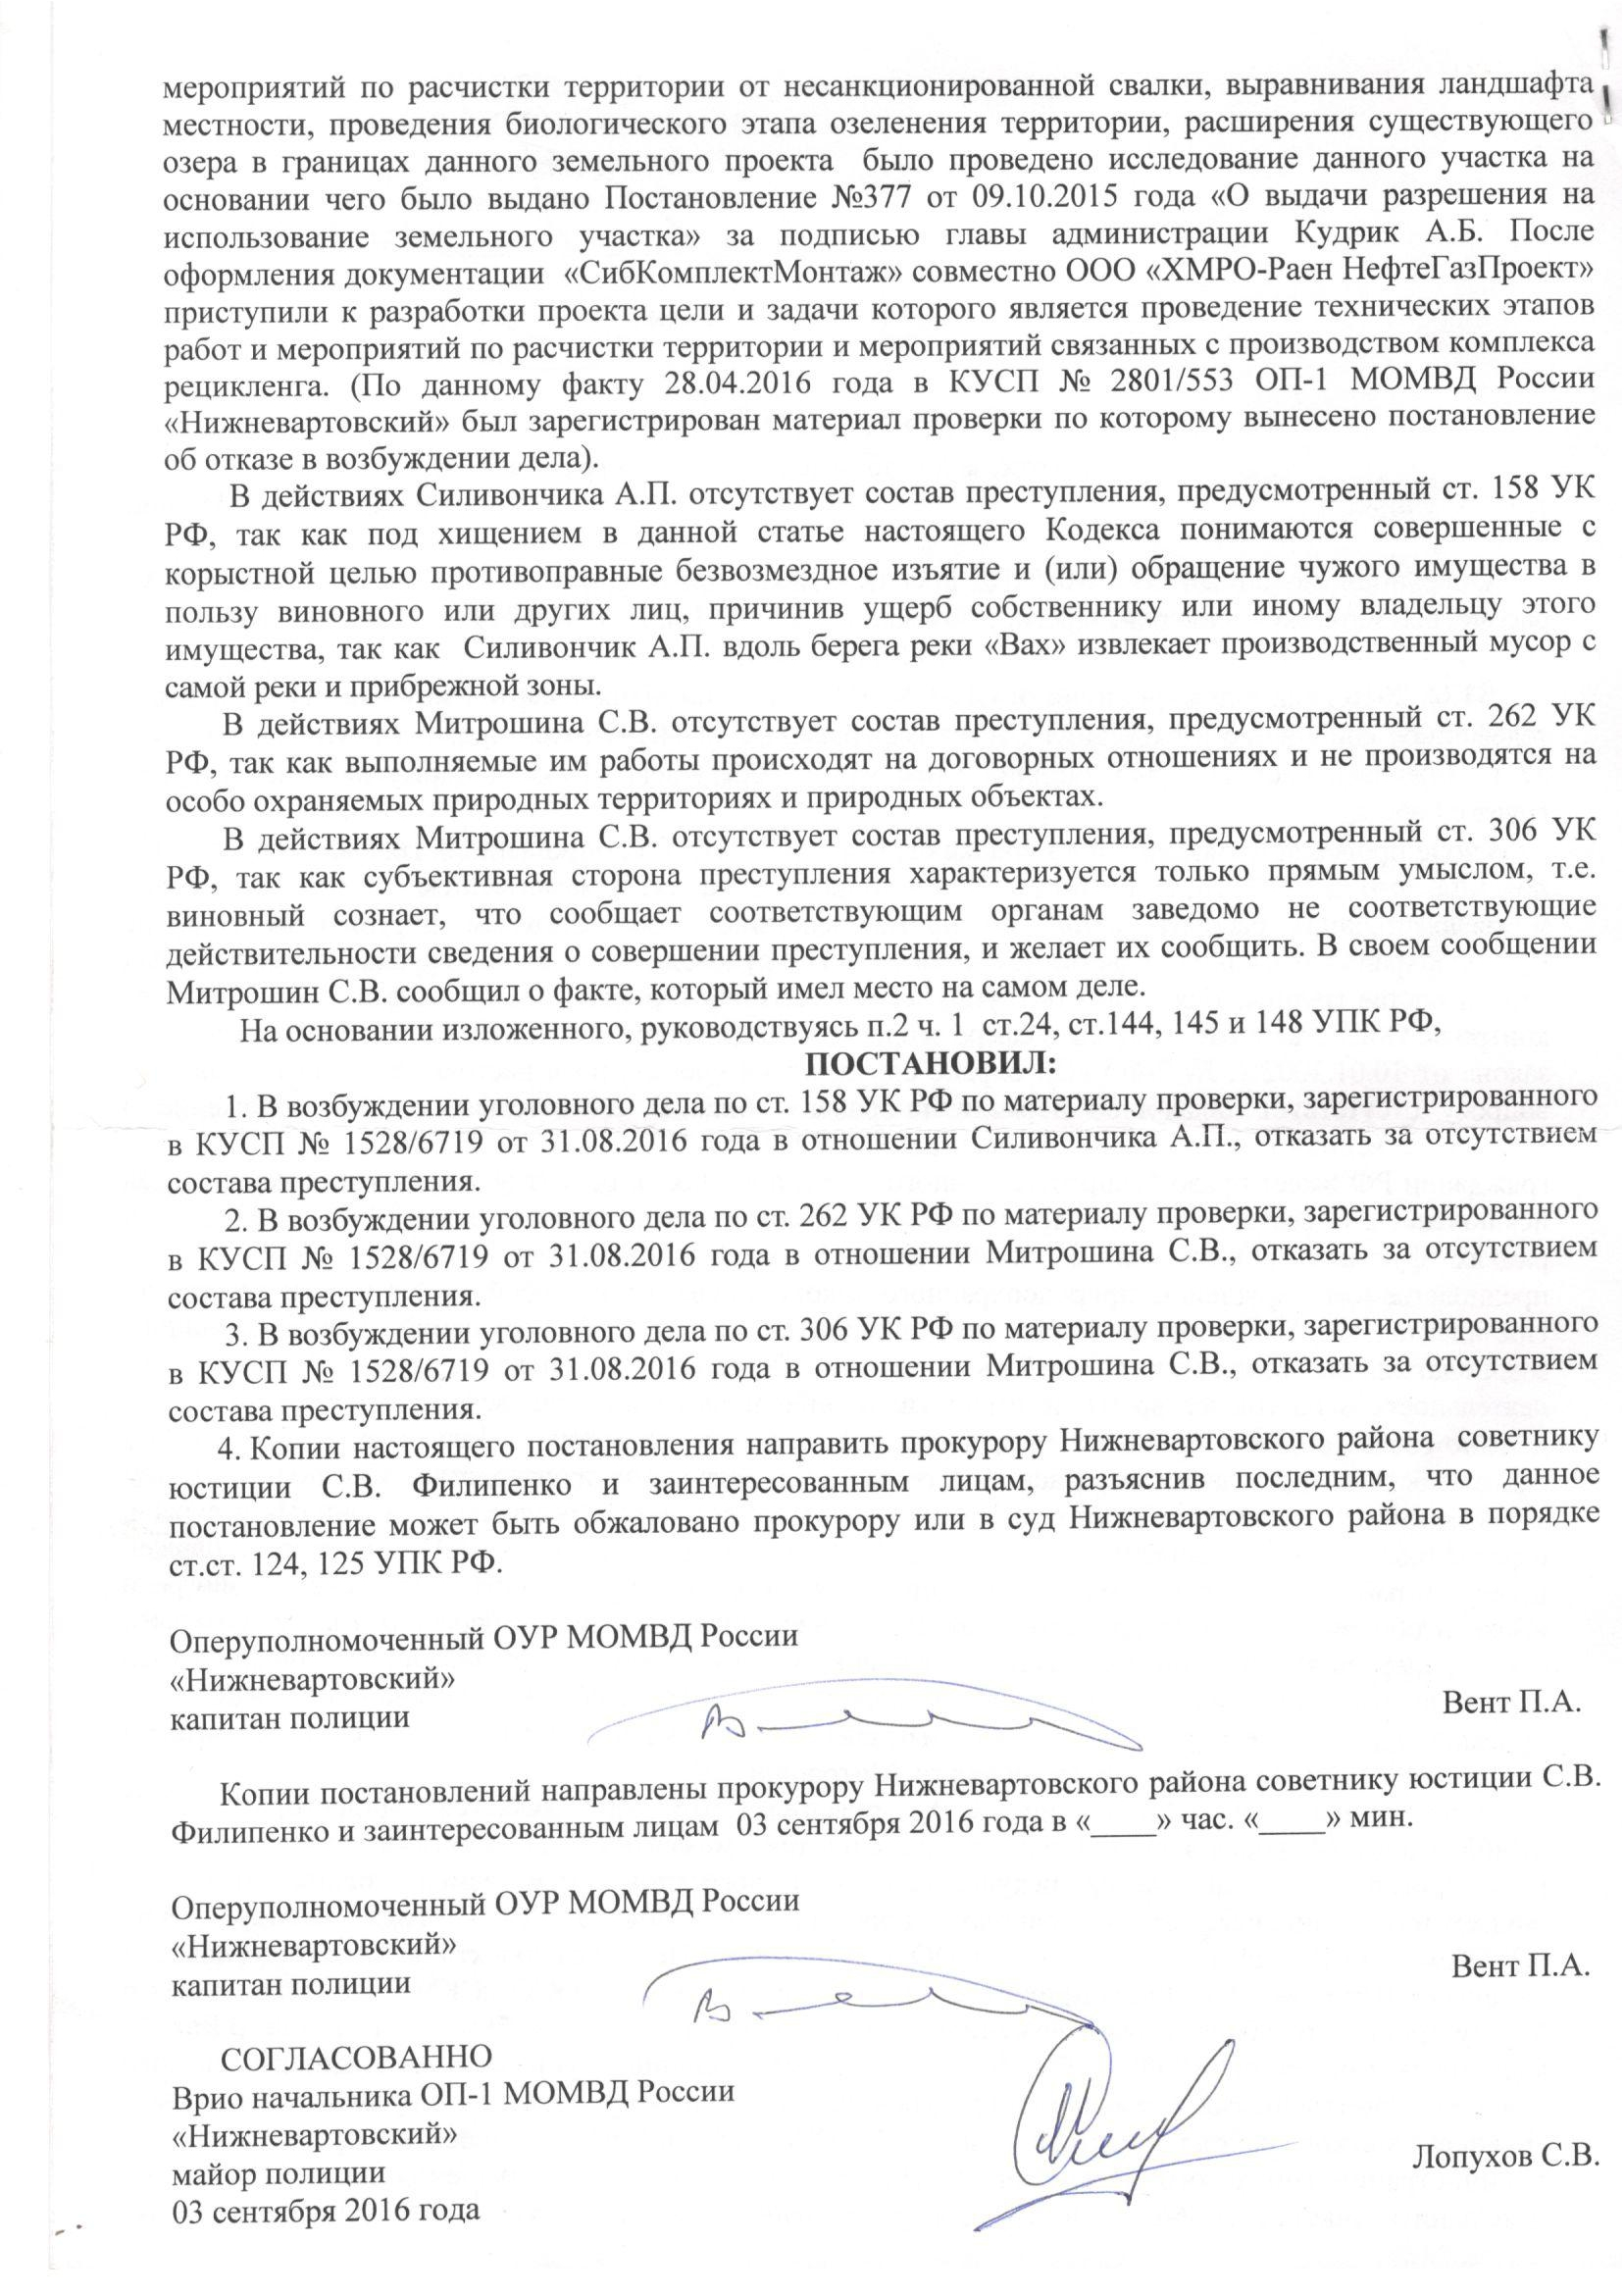 Отказ ГРЭС-003